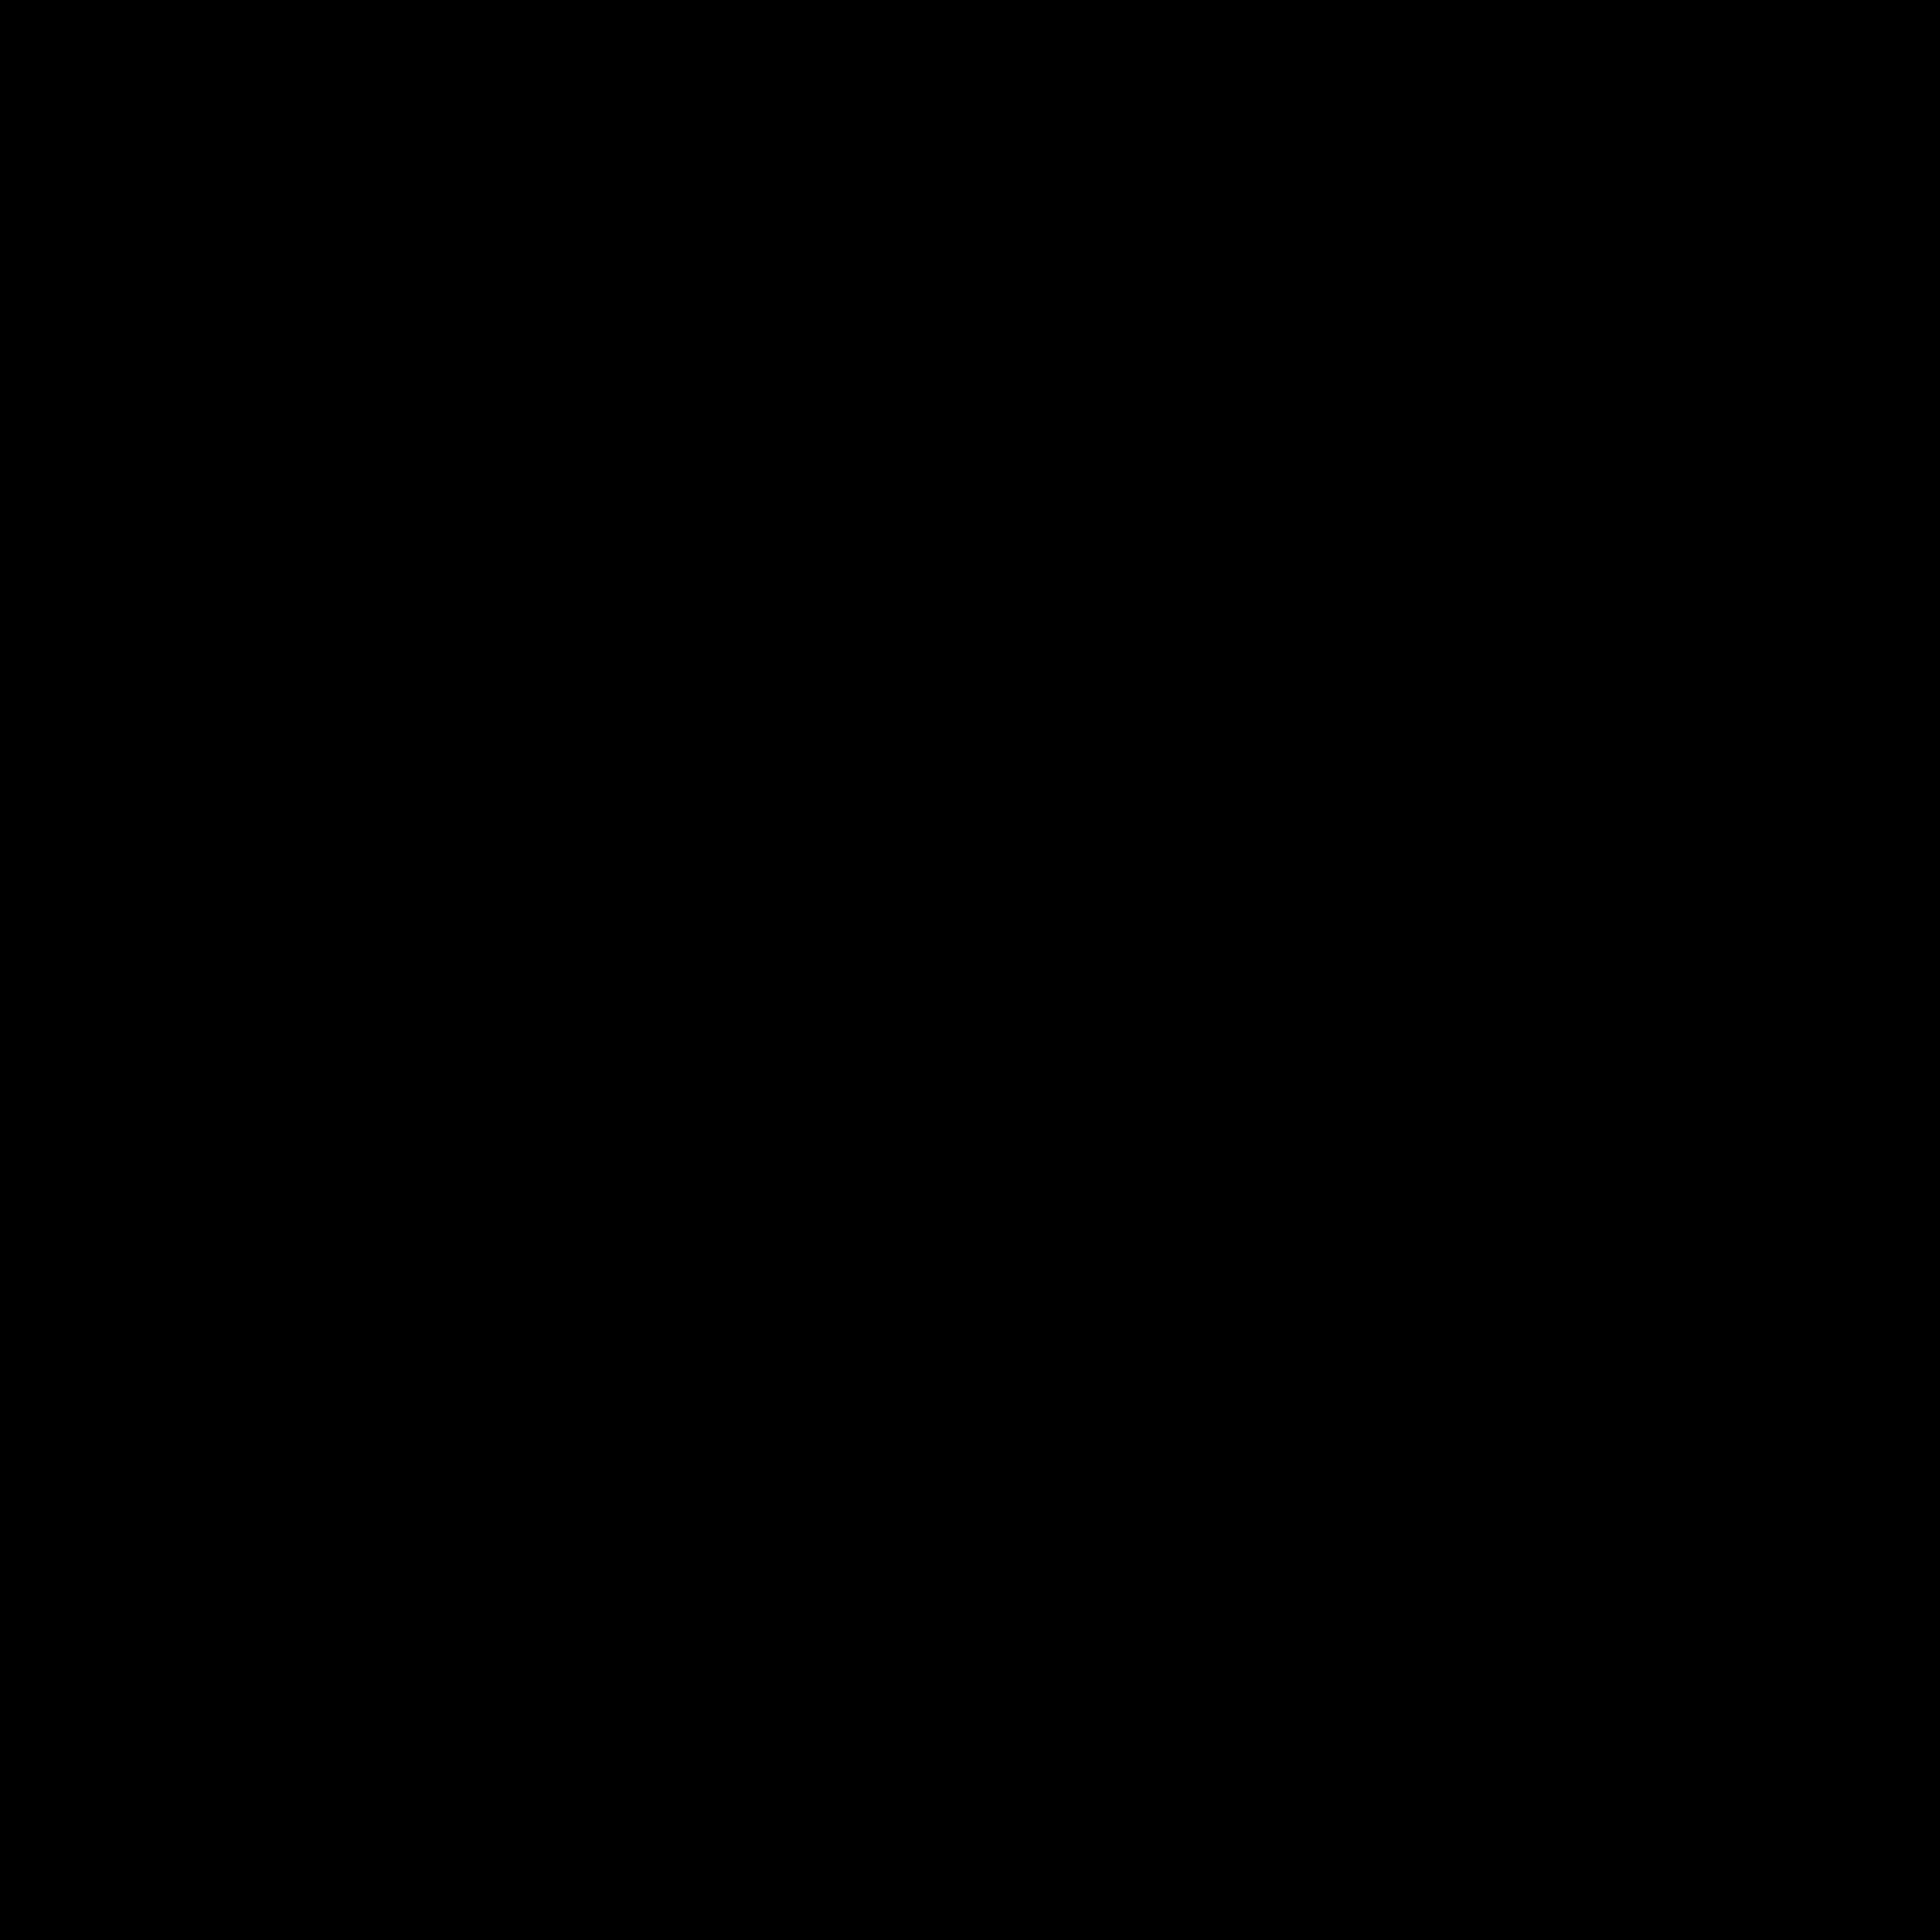 2000x2000 Filewoman Silhouette 52.svg